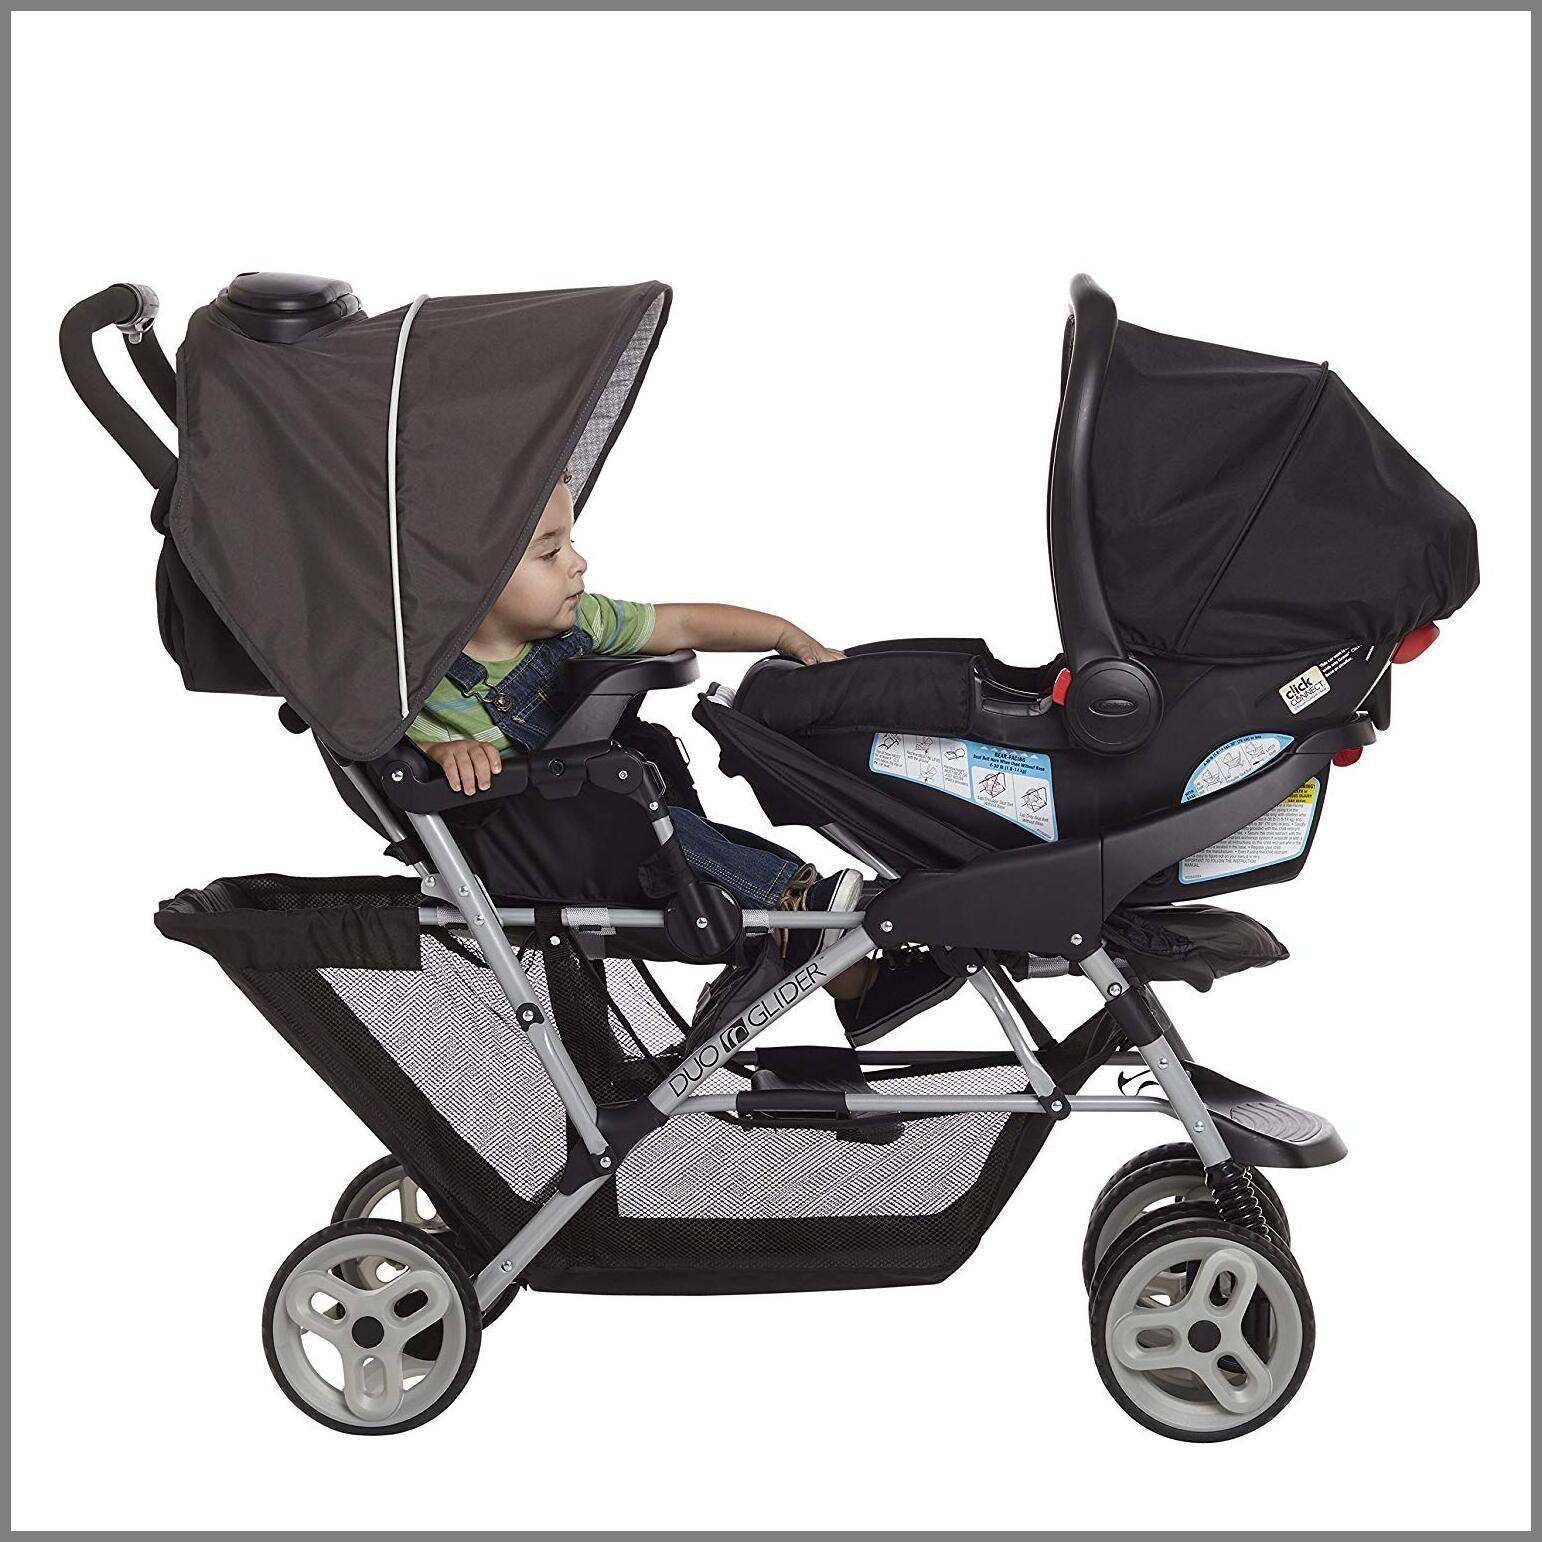 46++ Double stroller graco duoglider ideas